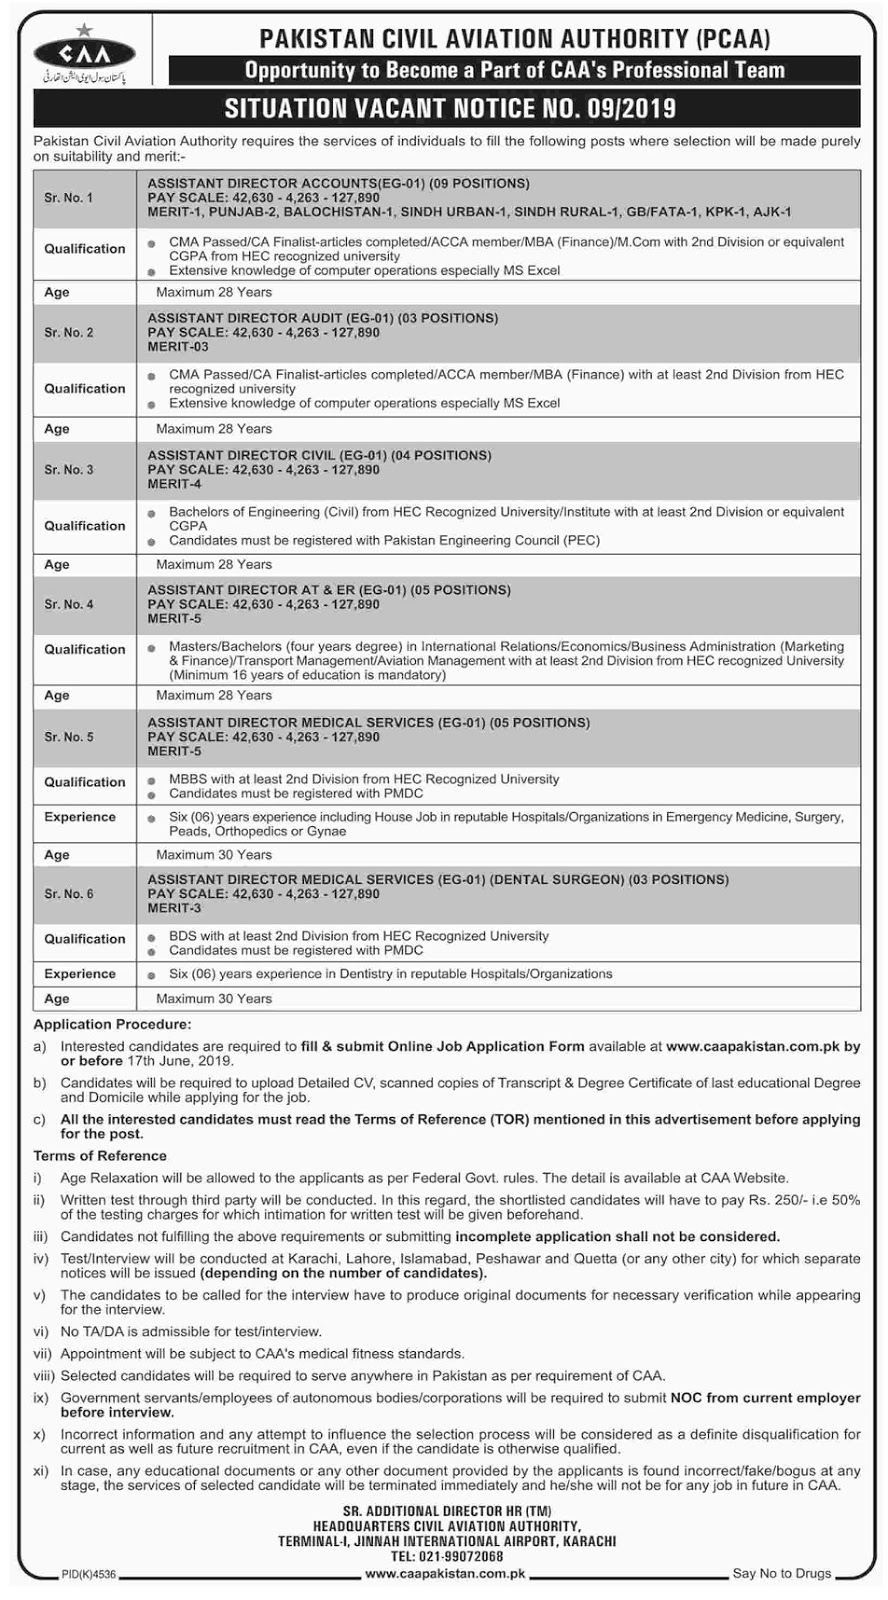 Pakistan Civil Aviation Authority (PCAA), Jobs May 2019